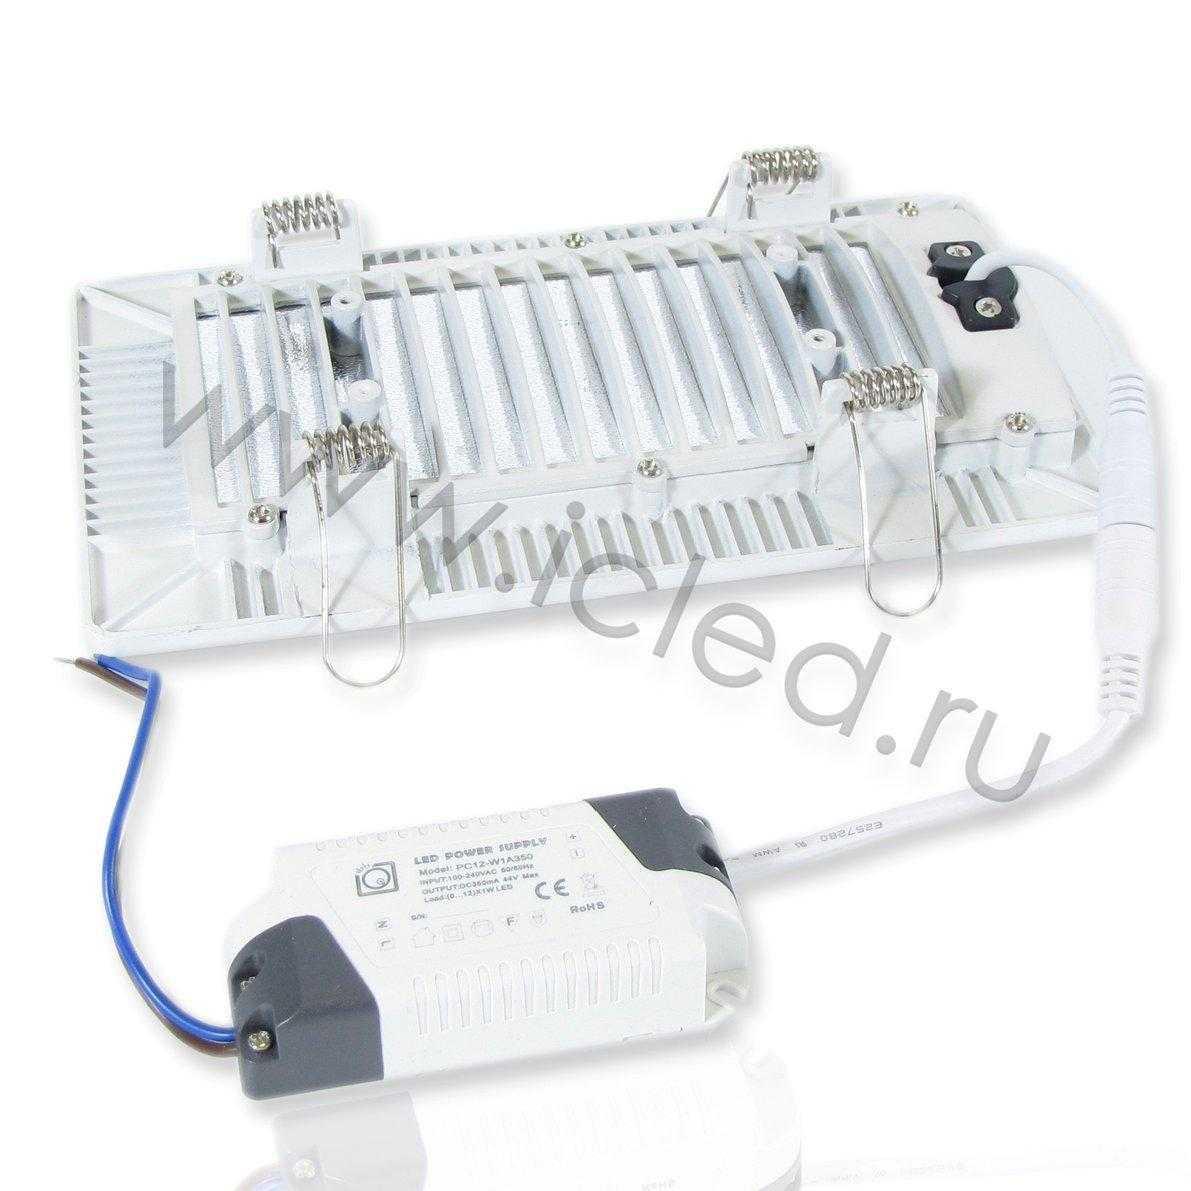 Светодиодная панель SPN-CWA (12W, 220V, White)